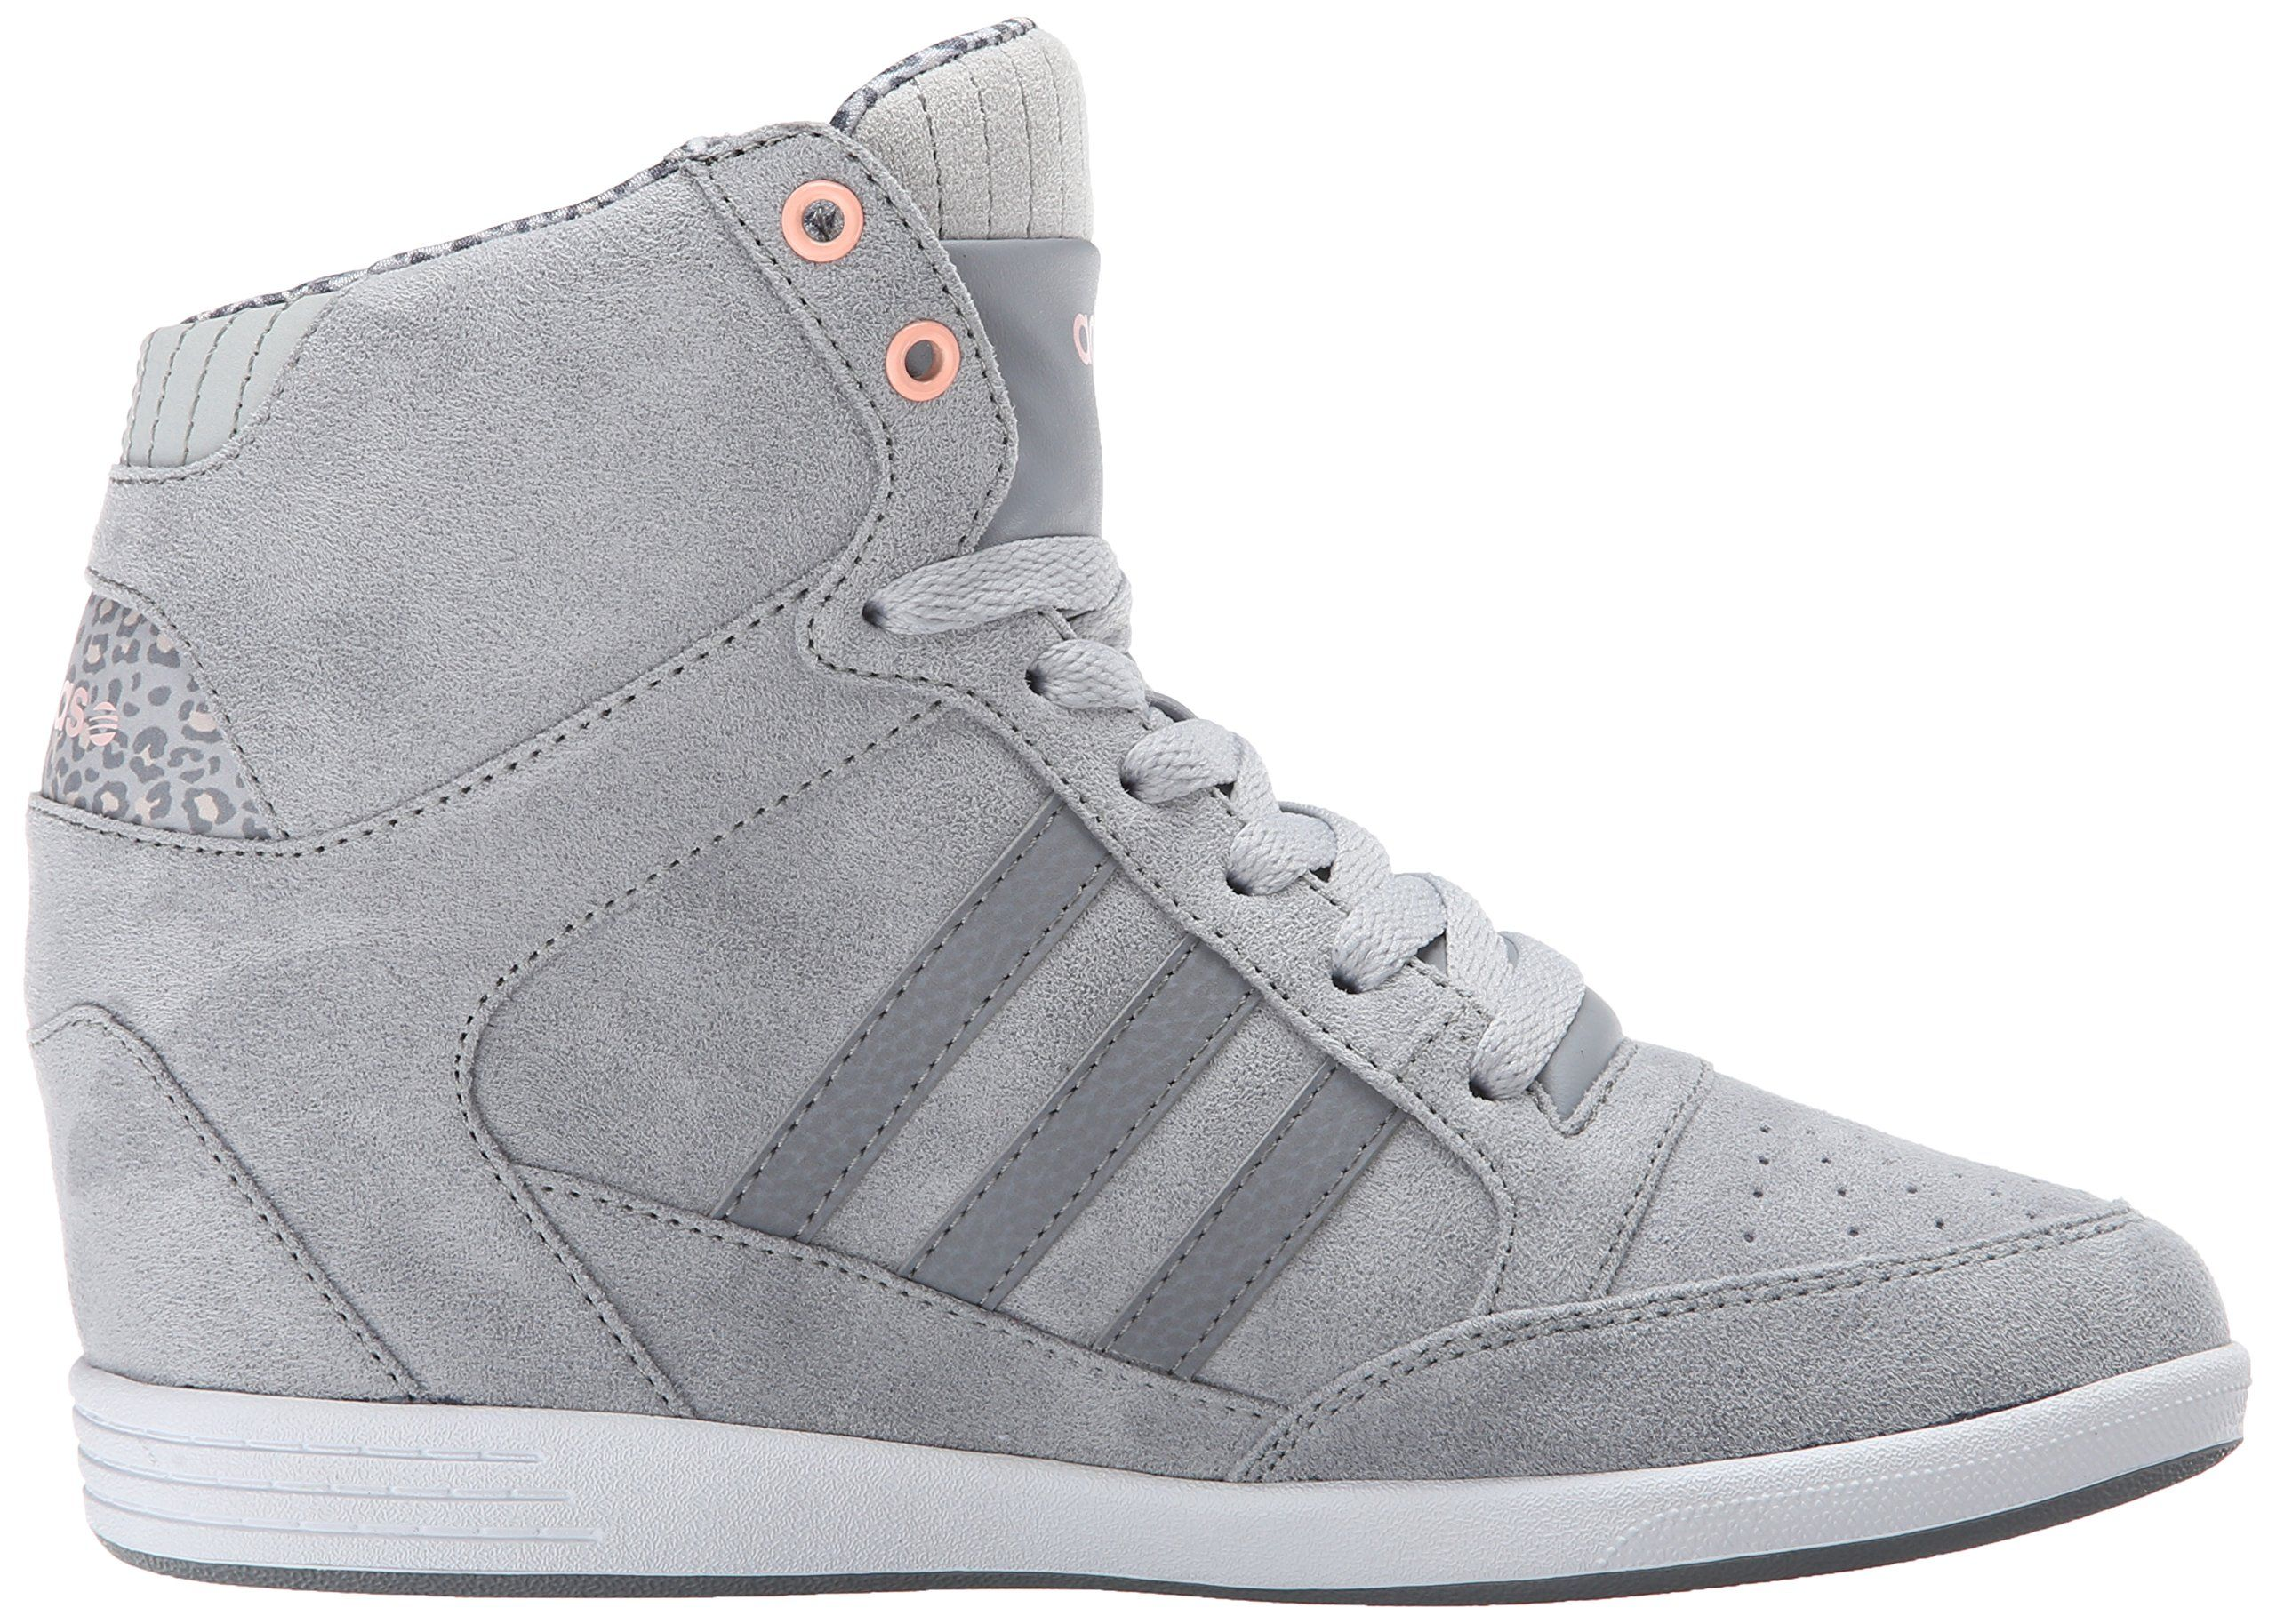 21e9bf9d7333 Amazon.com  adidas NEO Women s Weadidas NEO Super Wedge Sneaker  Shoes